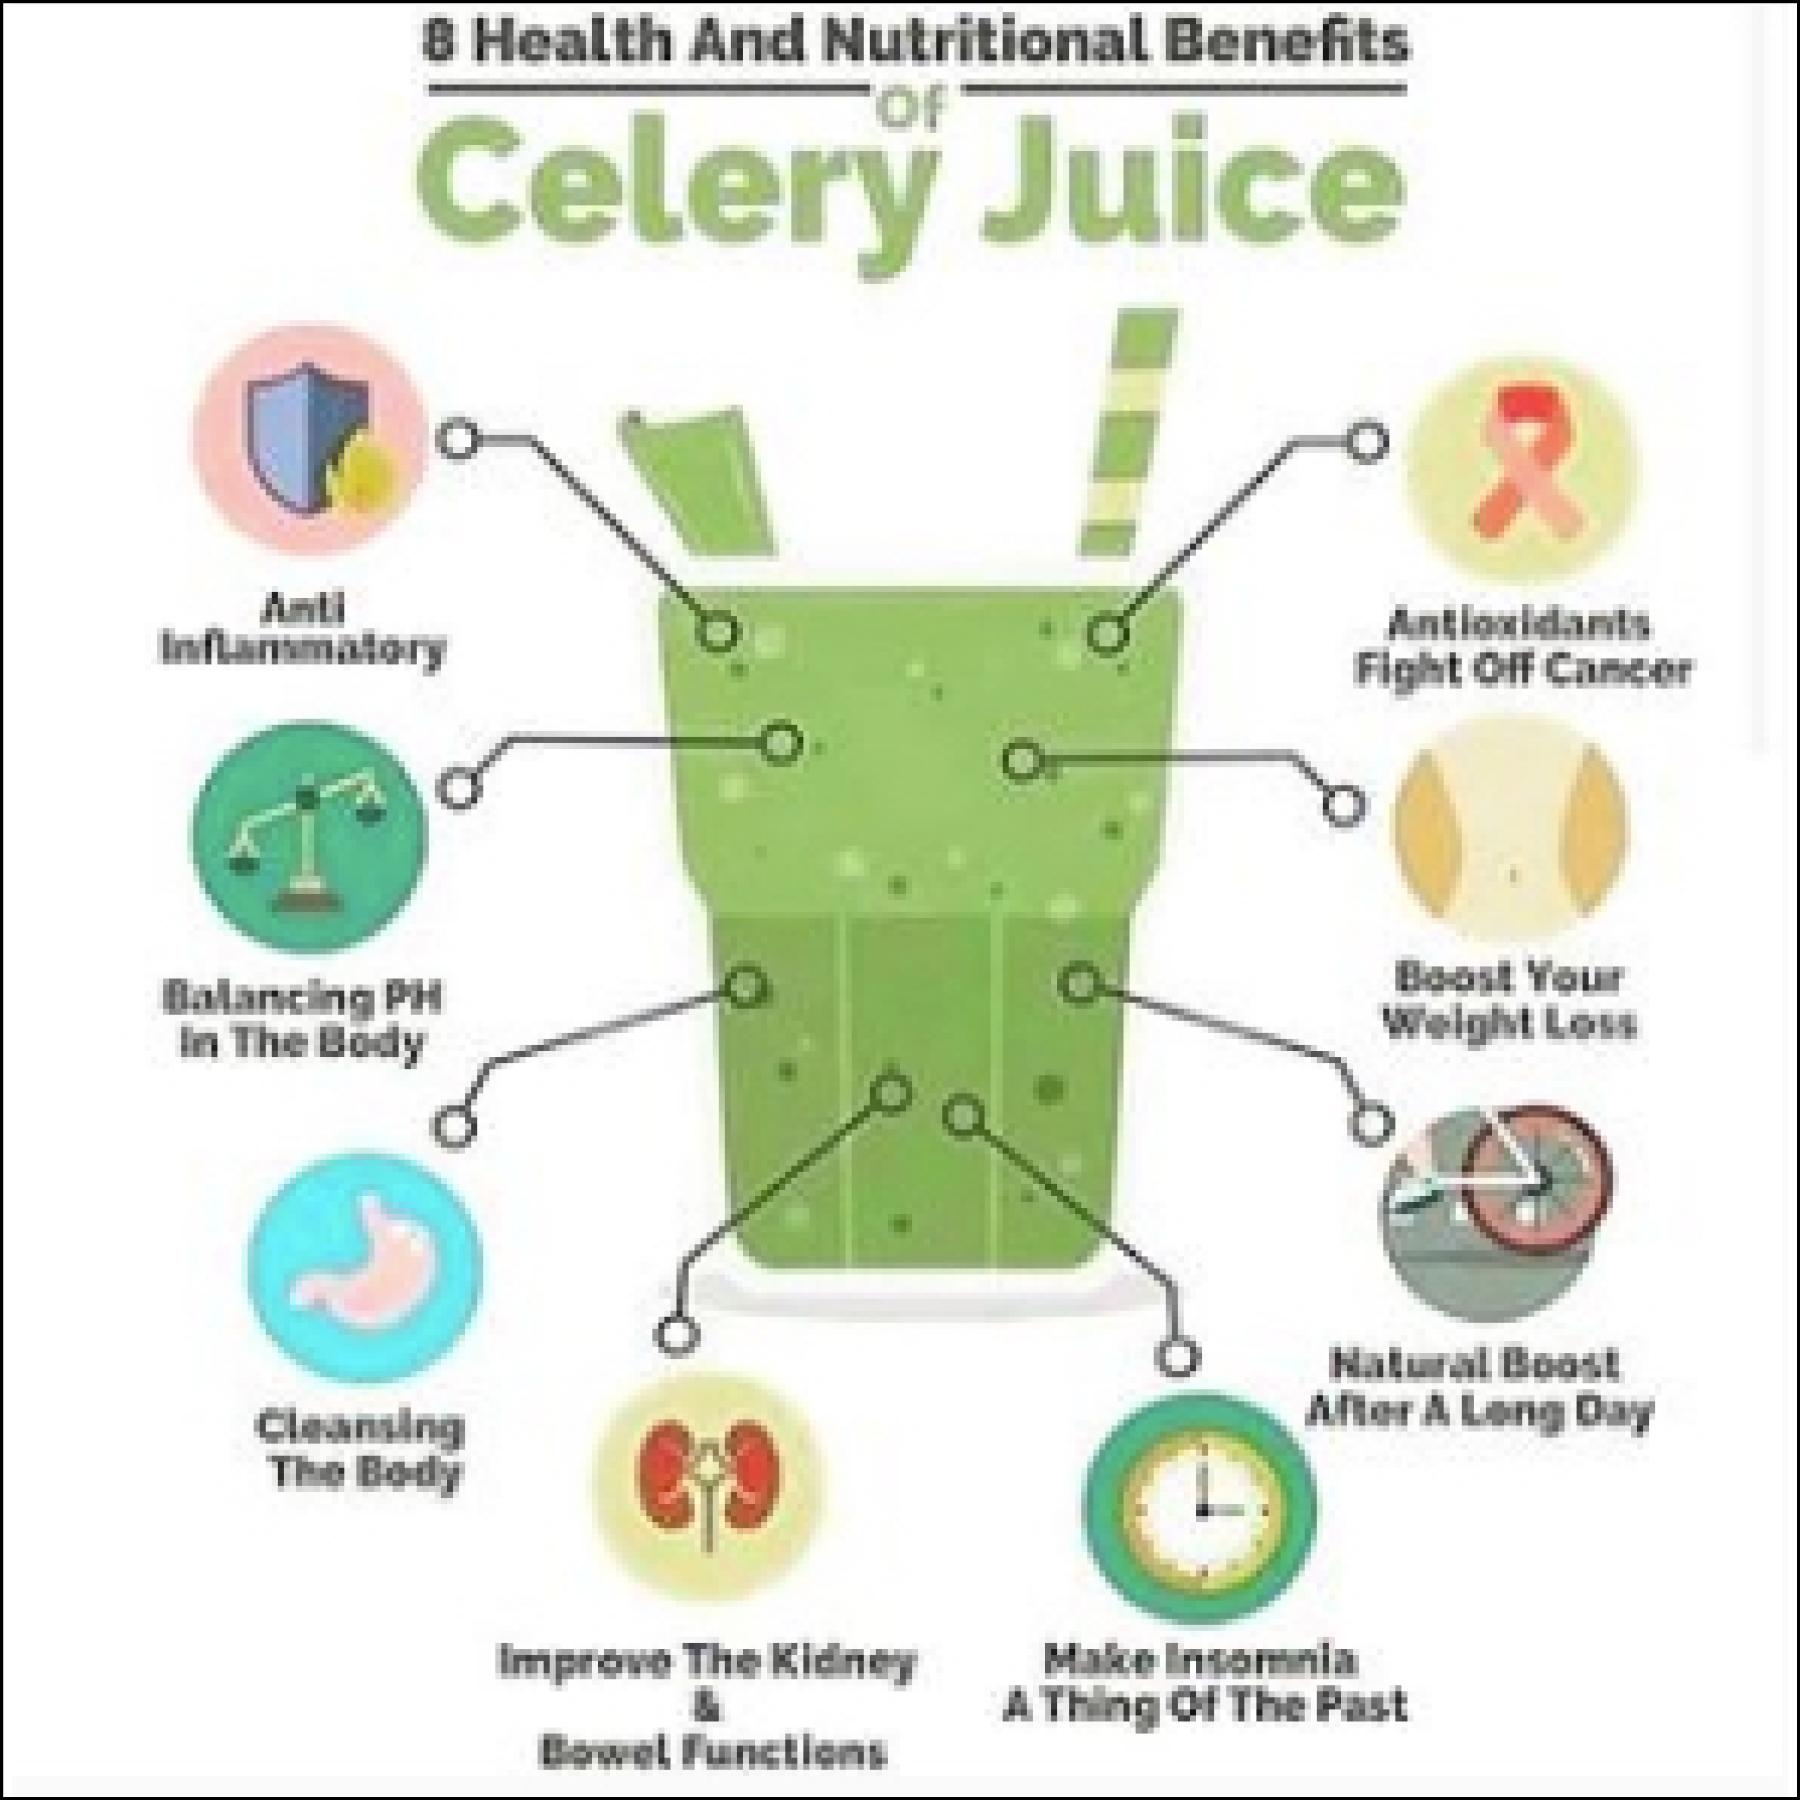 The Benefits of Celery Juice